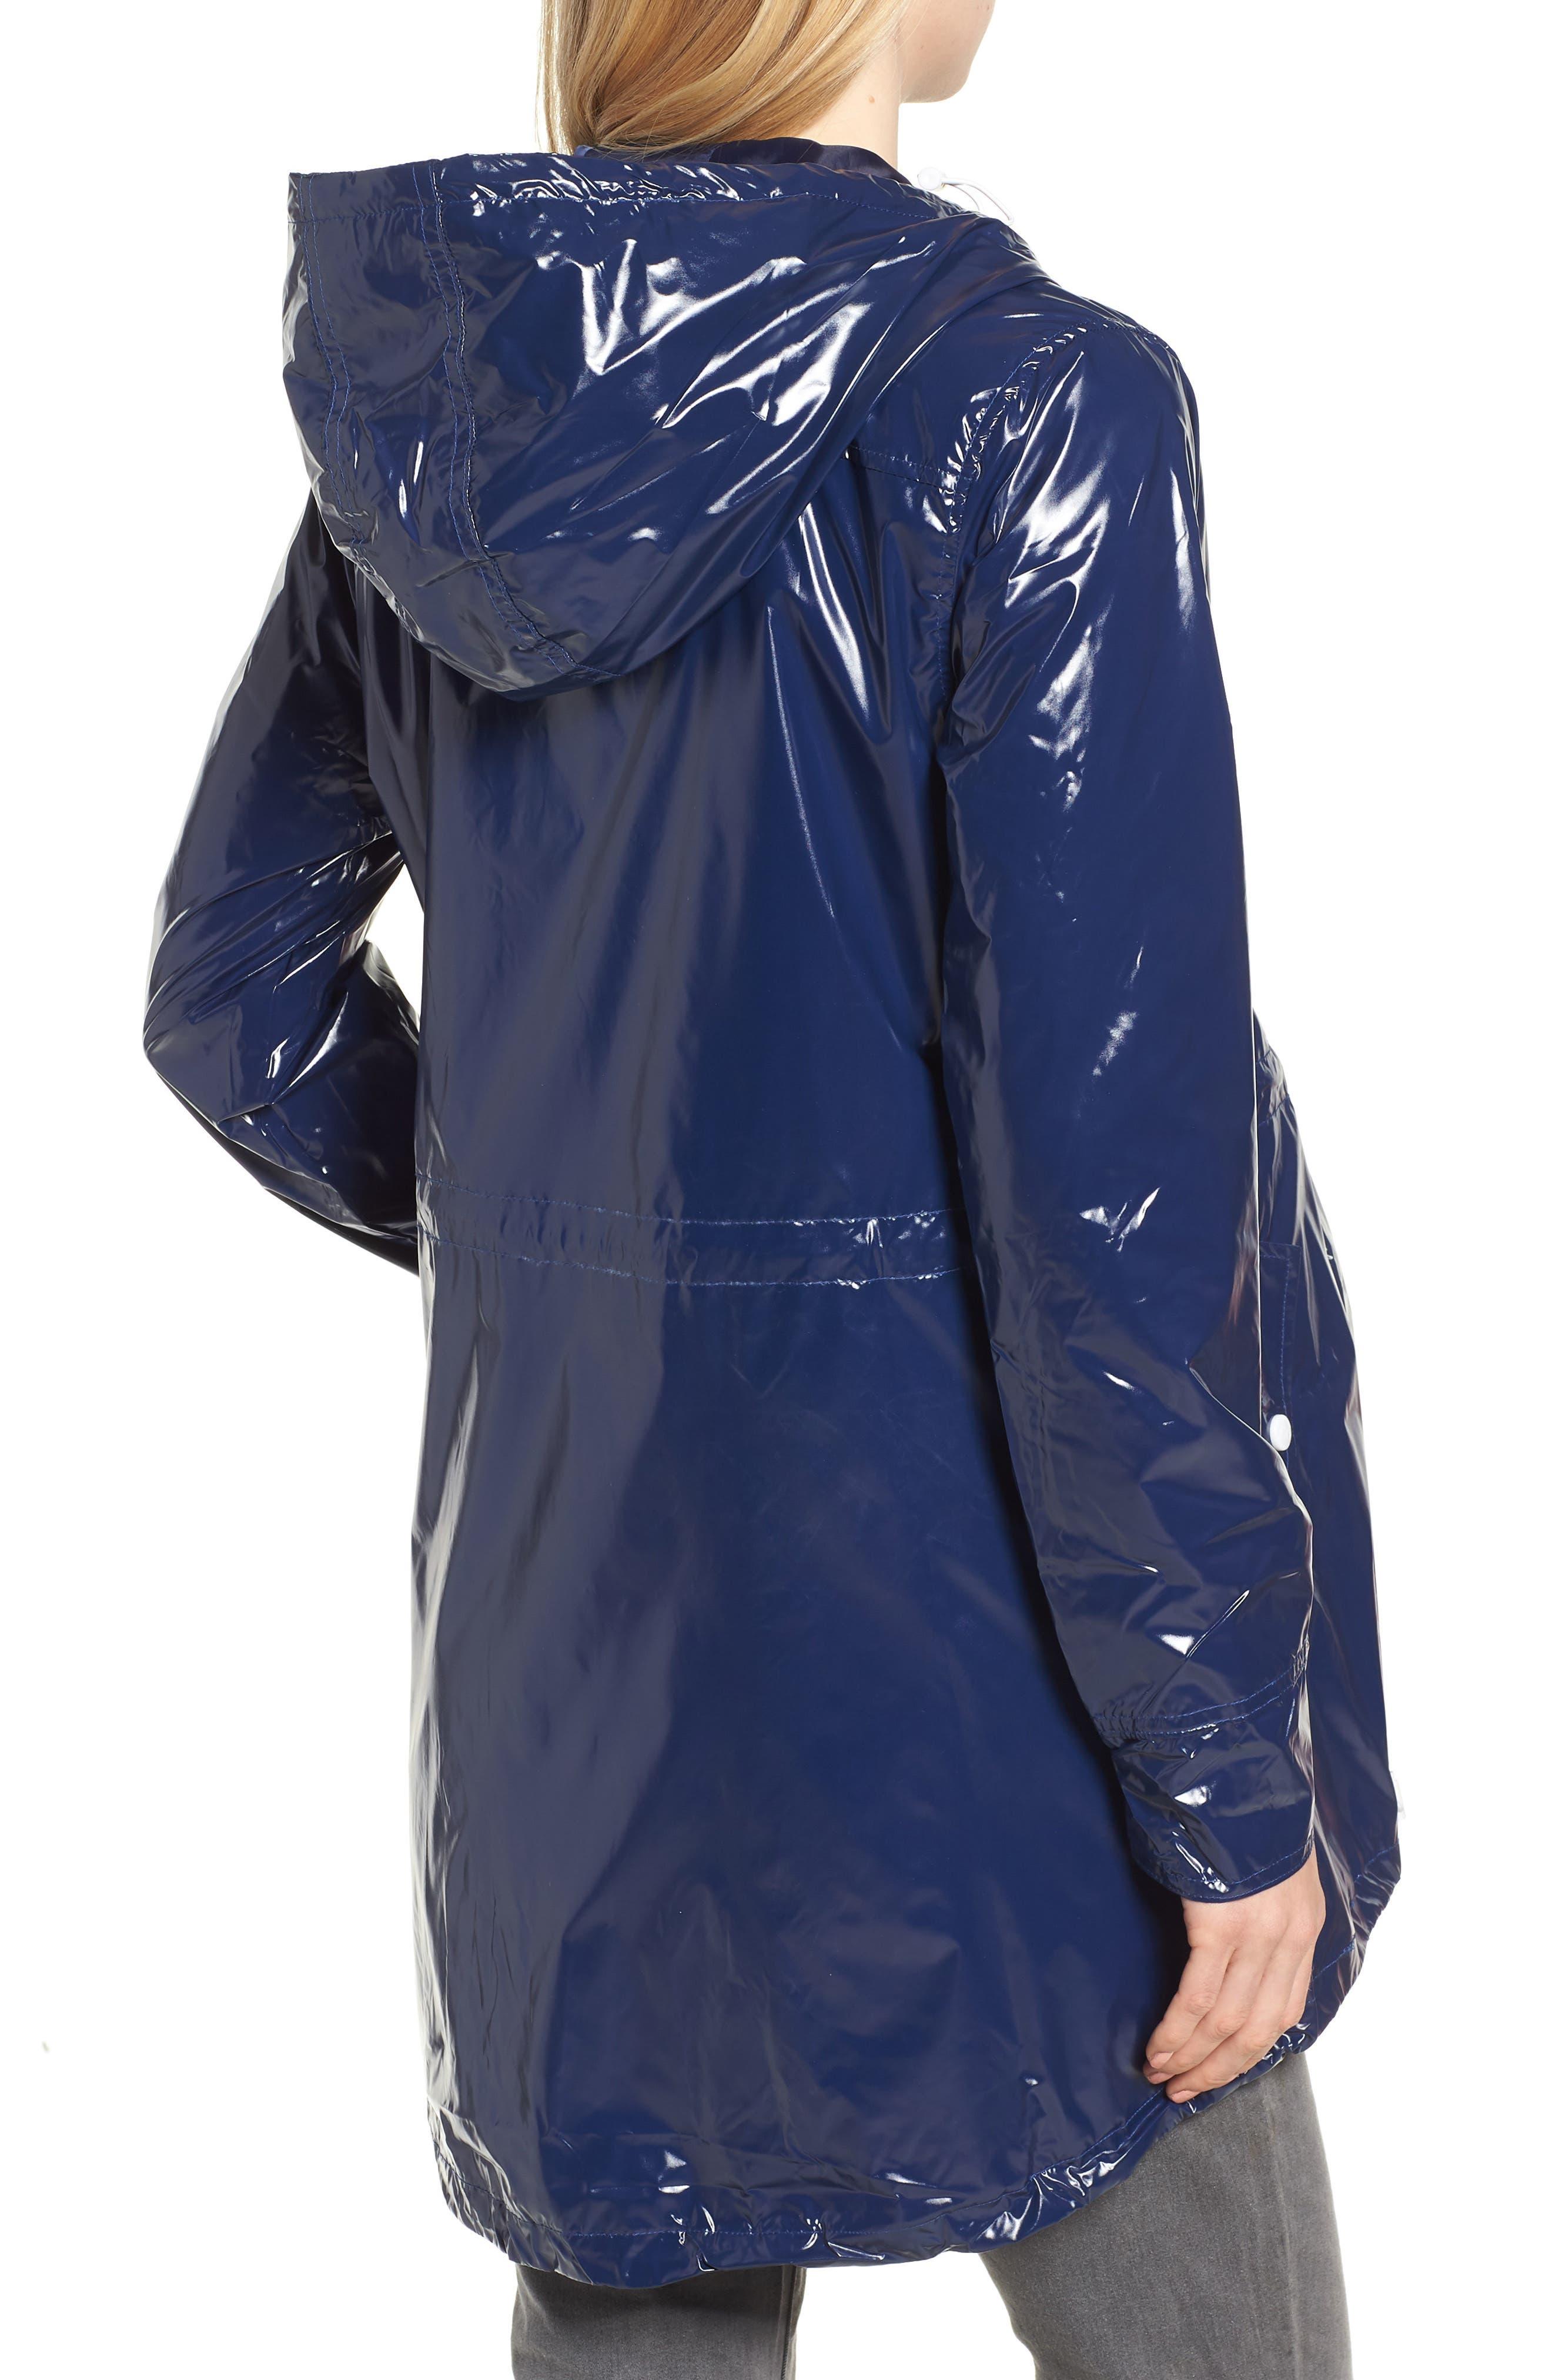 Waterproof Convertible 3-in-1 Maternity Raincoat,                             Alternate thumbnail 3, color,                             BRIGHT NAVY